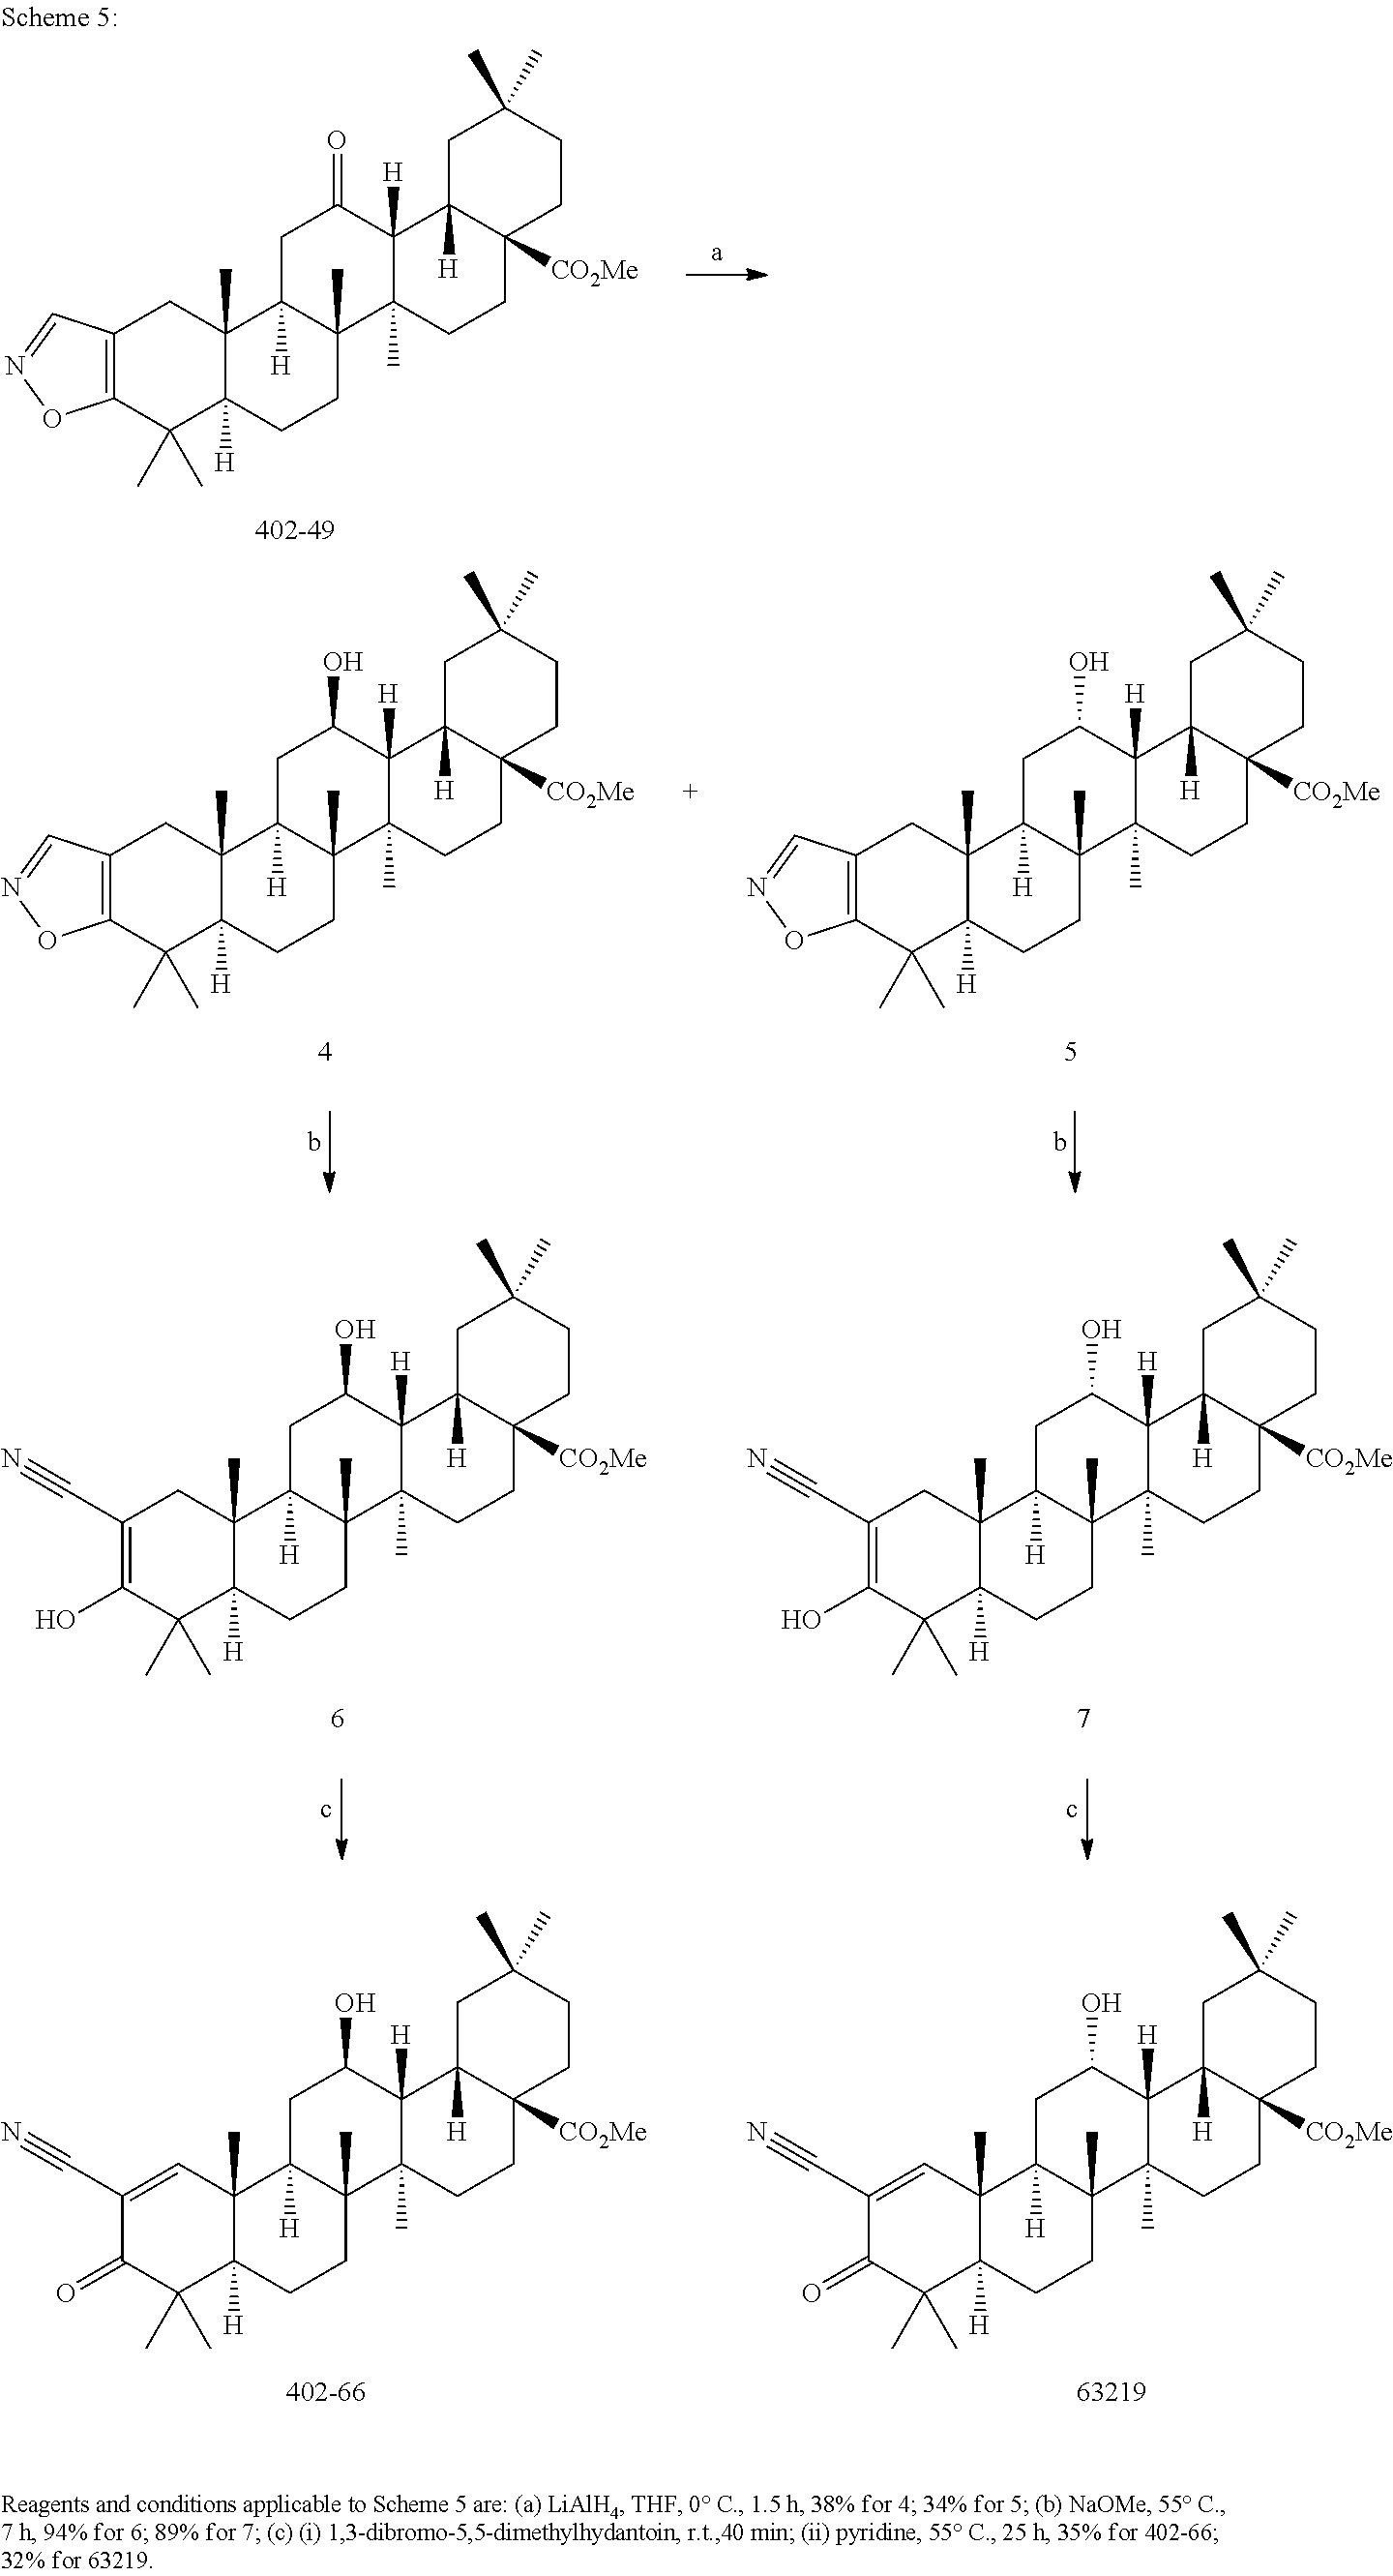 usre45288e1 antioxidant inflammation modulators oleanolic acid Asco Transfer Switch figure usre045288 20141209 c00047